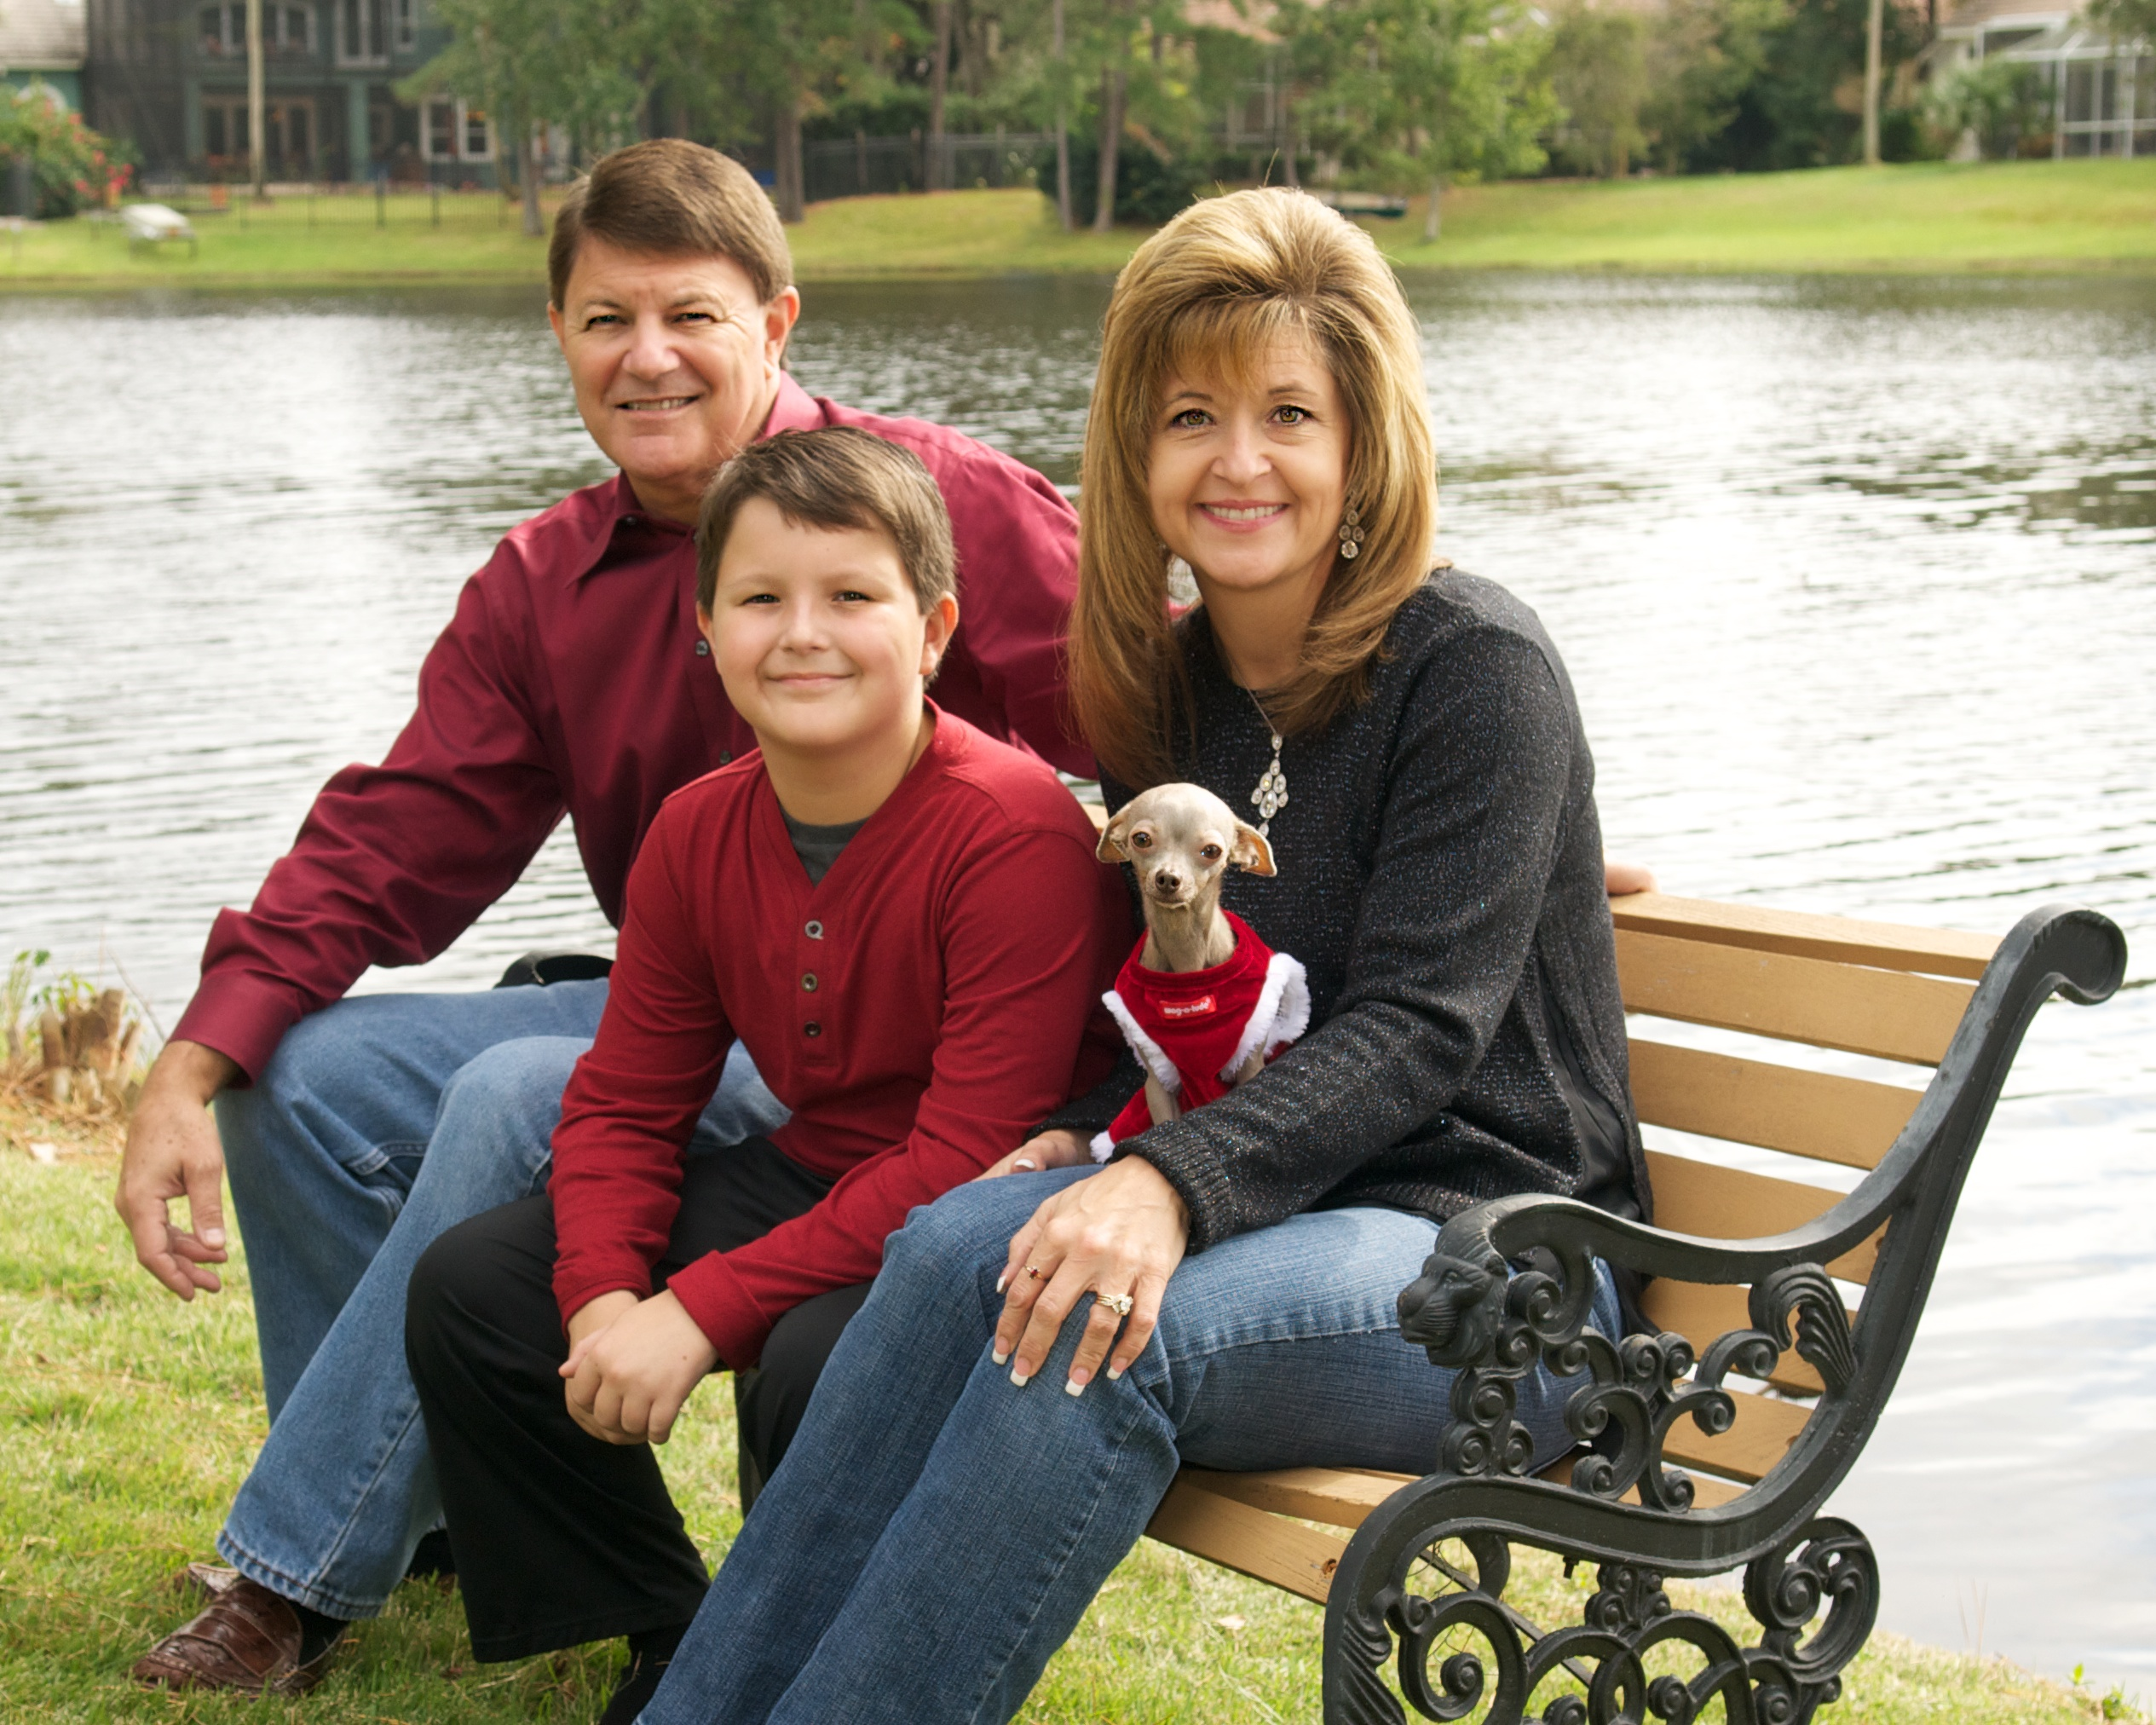 Jordan Smelski and Family